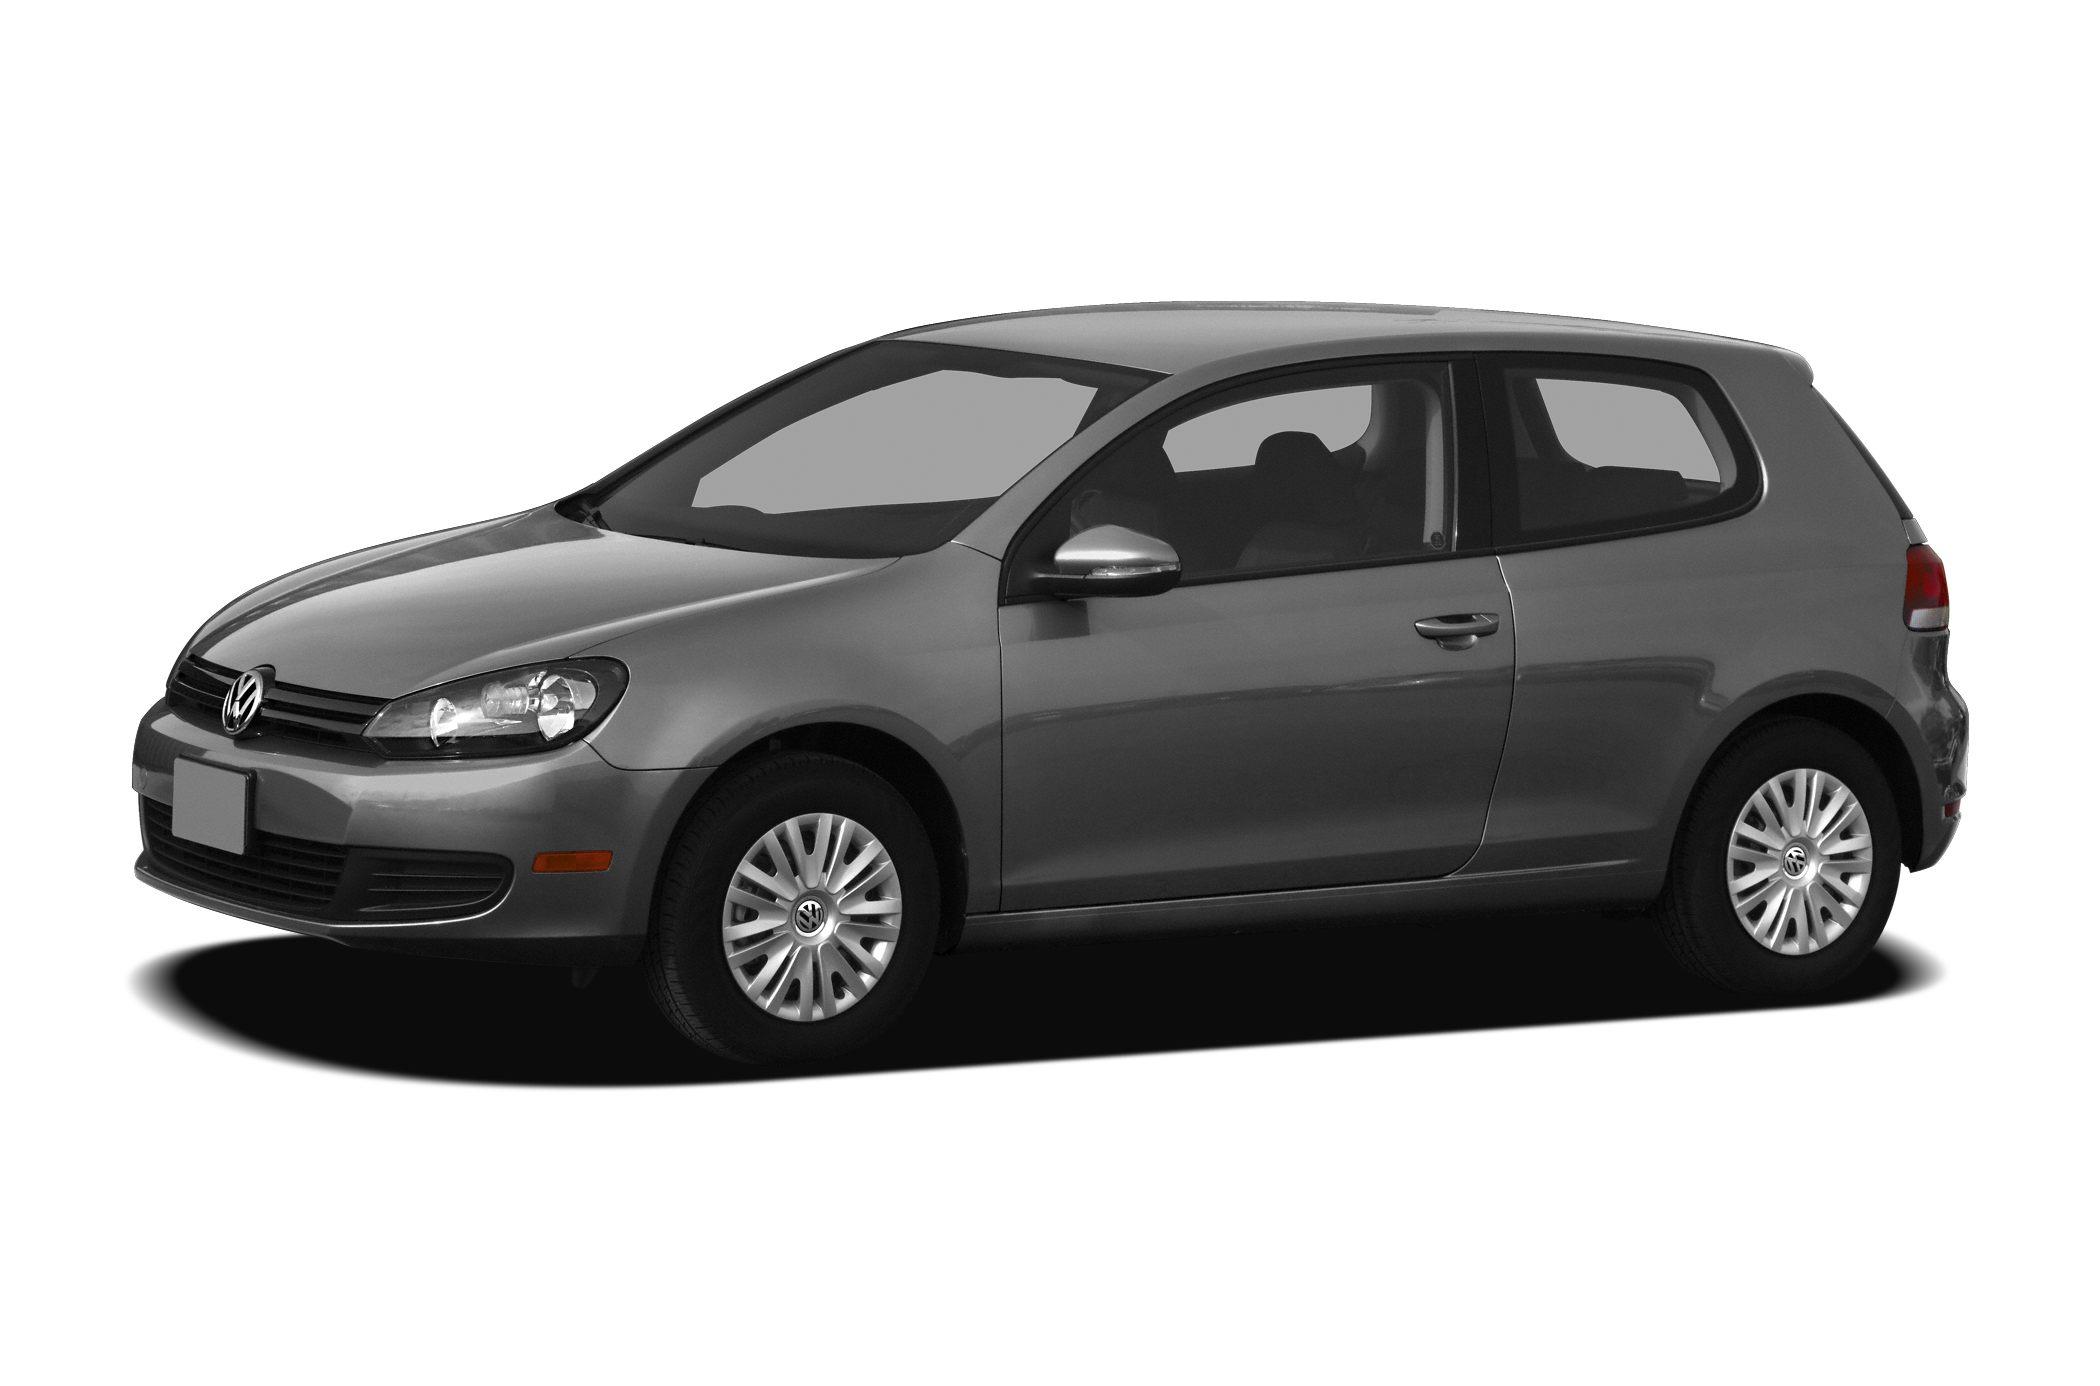 2011 volkswagen golf specs and prices rh autoblog com O4 VW Golf GTI Motor Motor VW Golf MK4